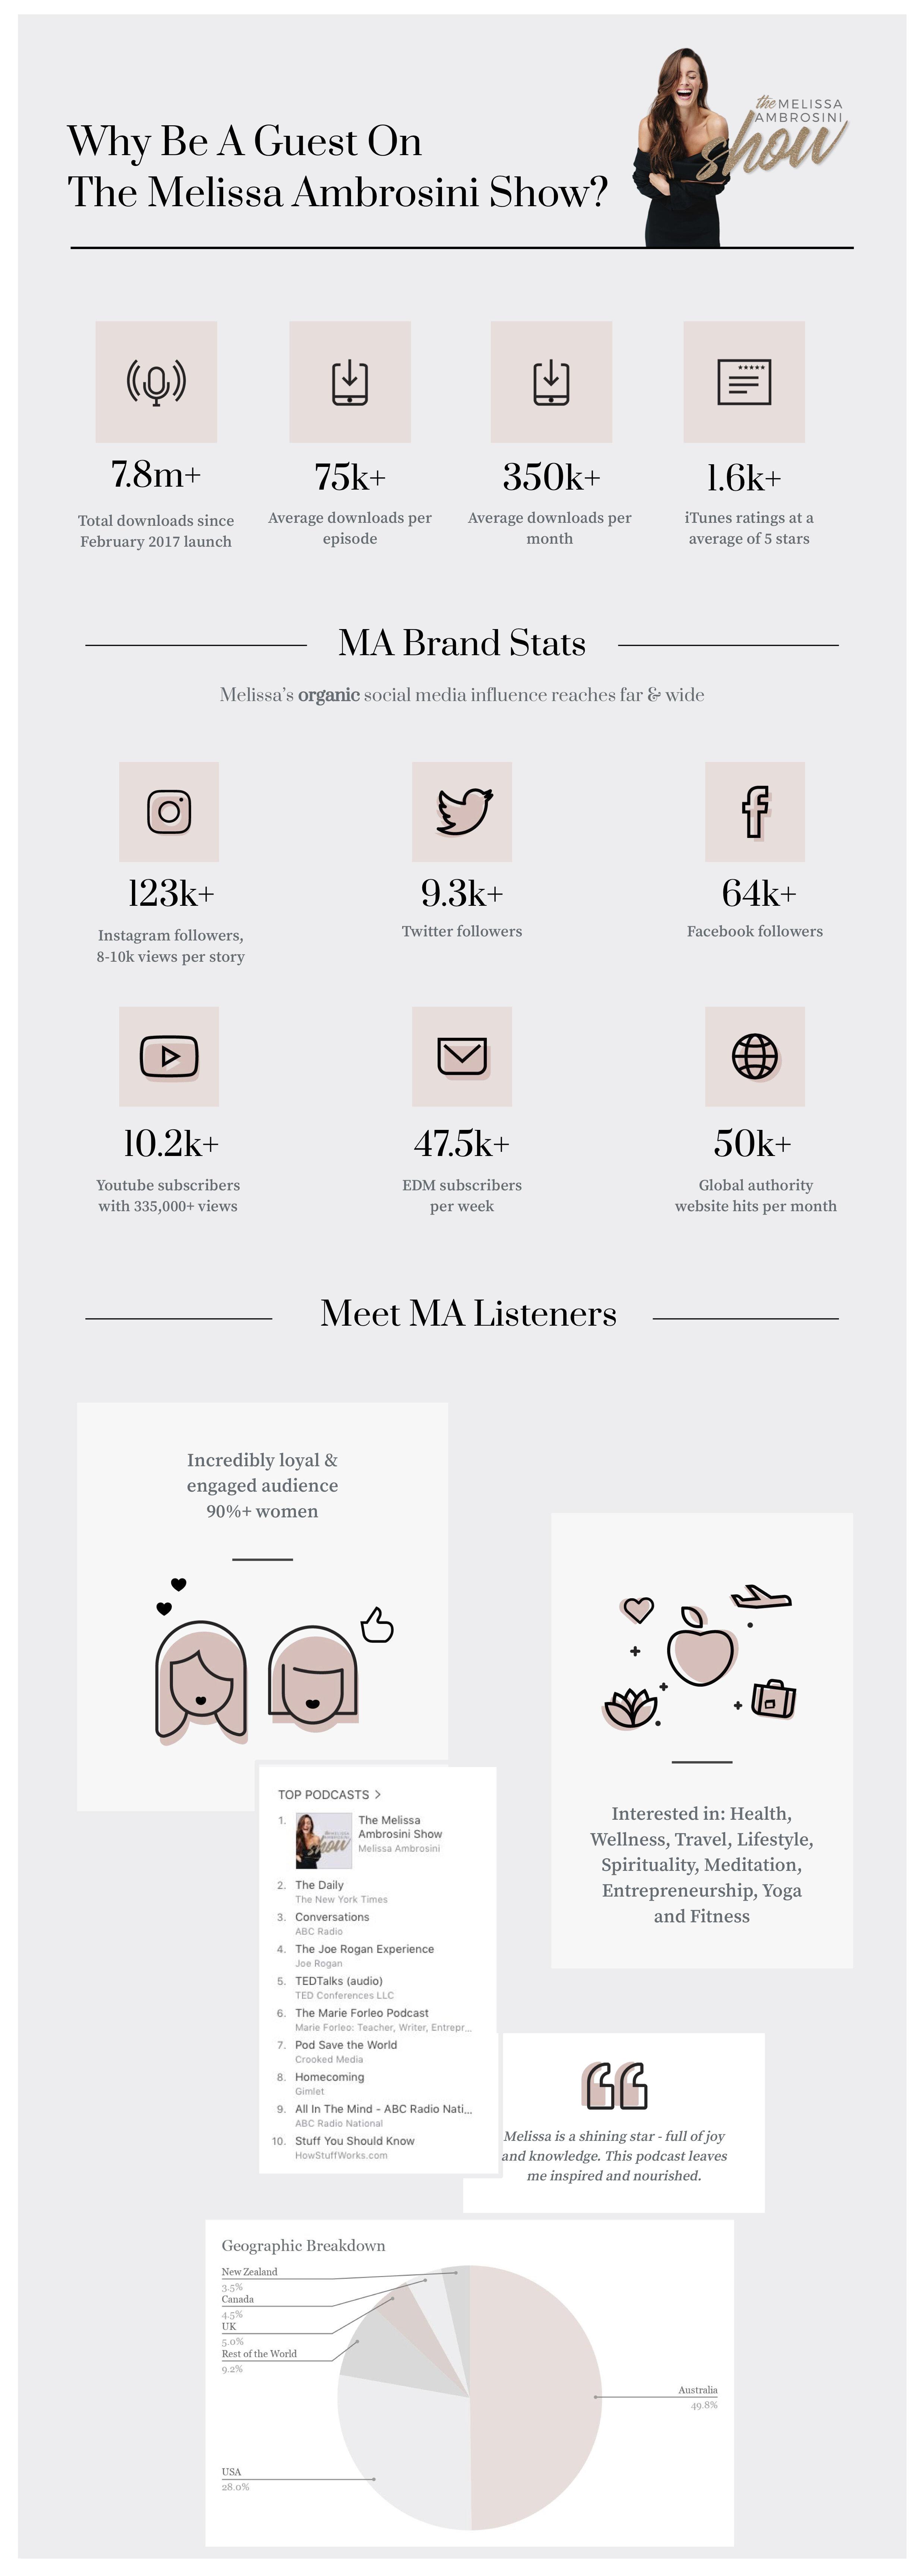 Infographic-TheMelissaAmbrosiniShow copy.jpg